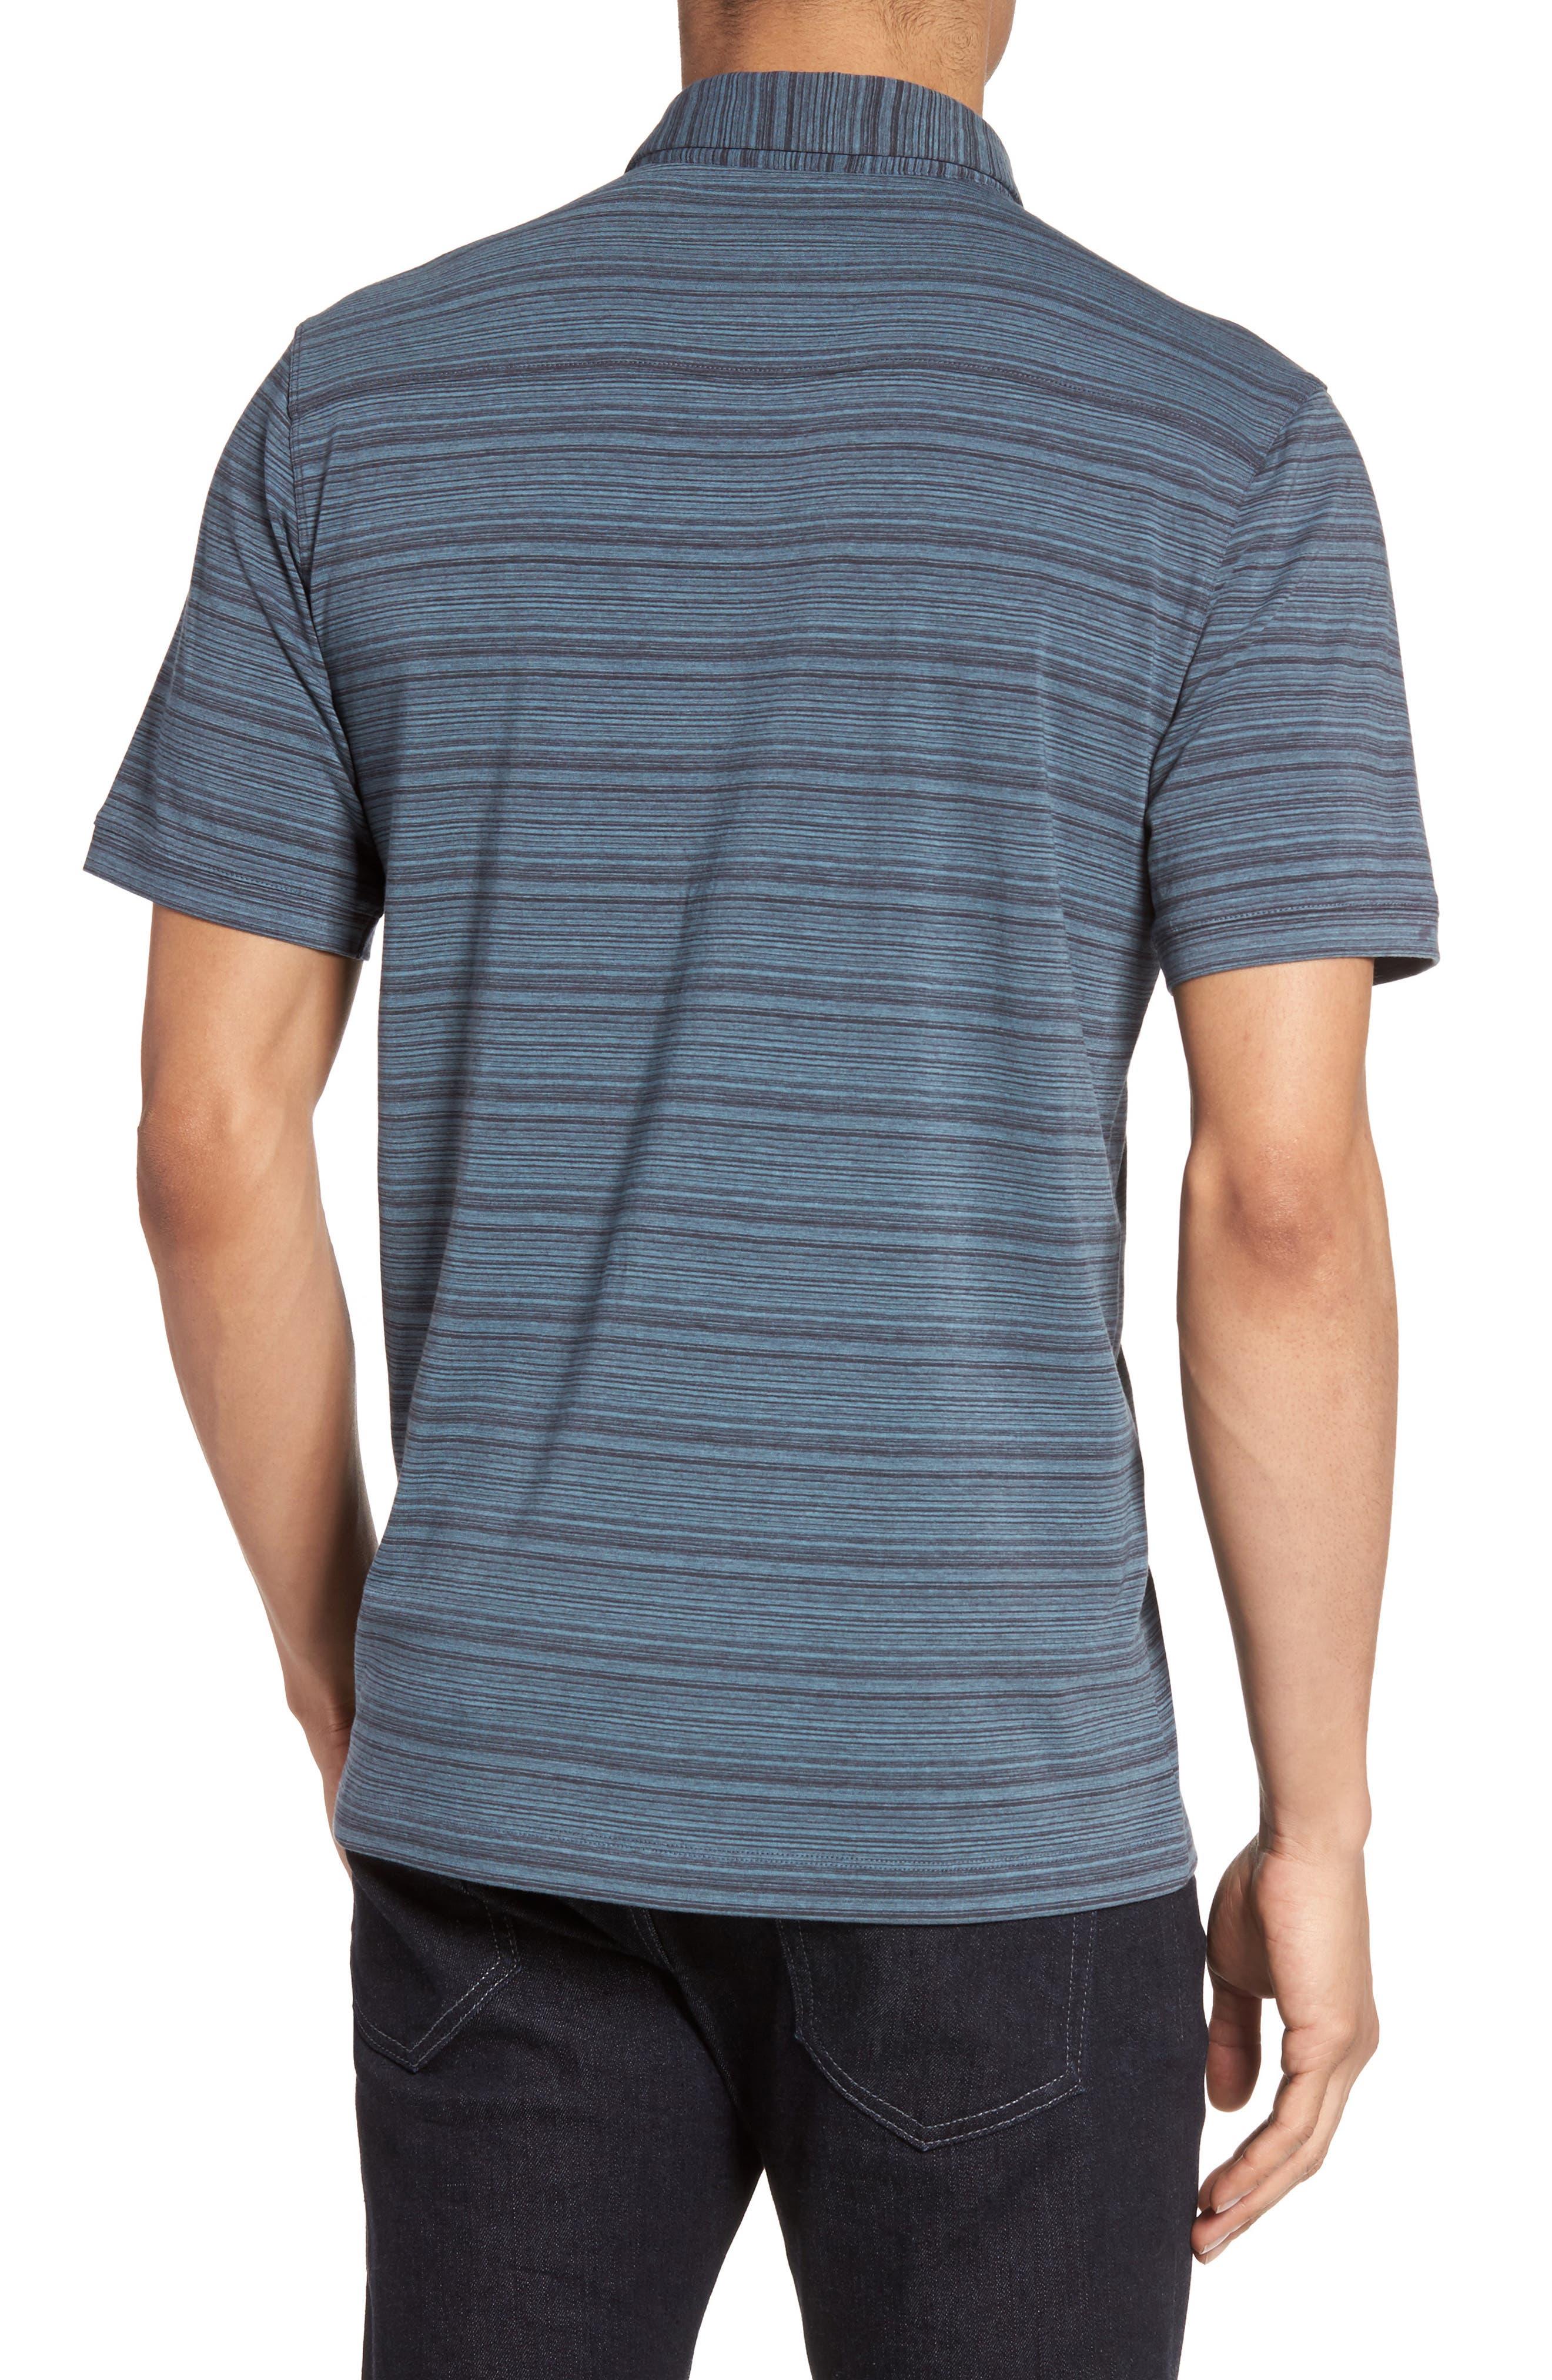 Trim Fit Stripe Polo,                             Alternate thumbnail 2, color,                             Blue Dusk Varied Stripe